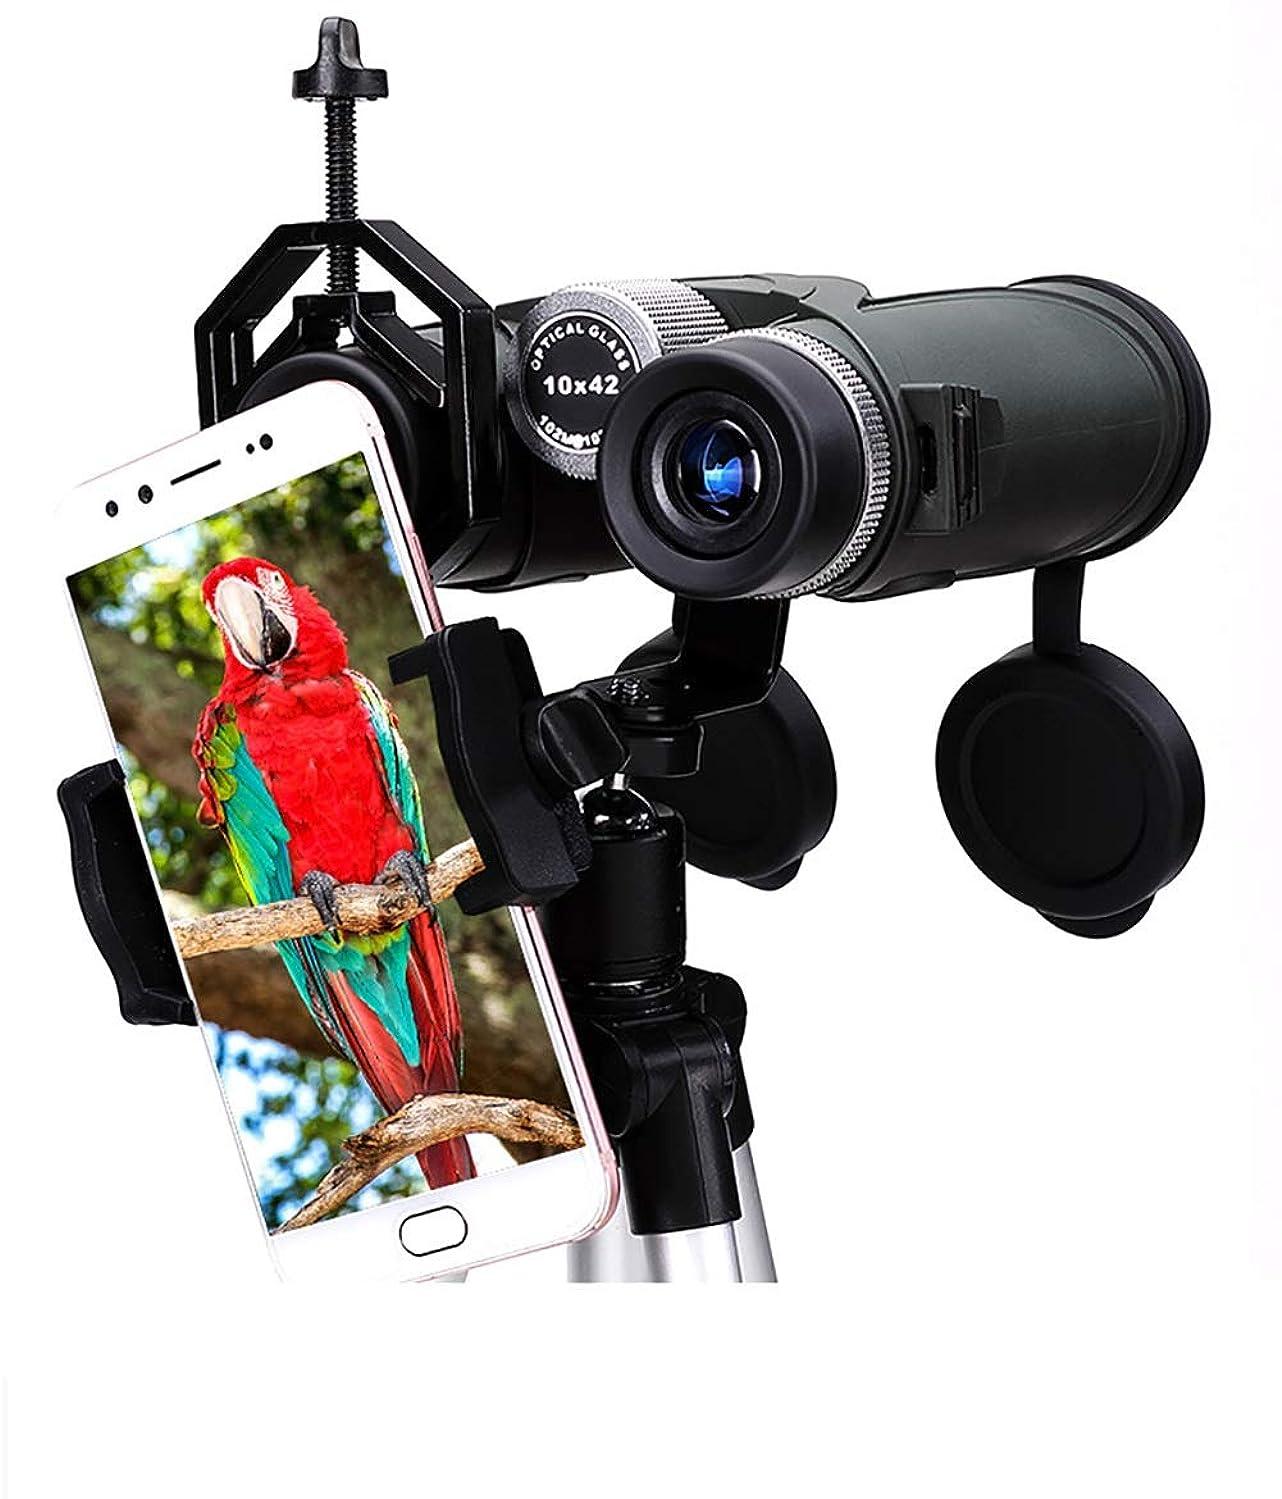 New Mobile Phone Camera Lens Kit, 10x Zoom Telephoto Lens, 4k HD Super Long-Range Shooting, Suitable Travel, Mountaineering, Watching Wildlife Scenery.